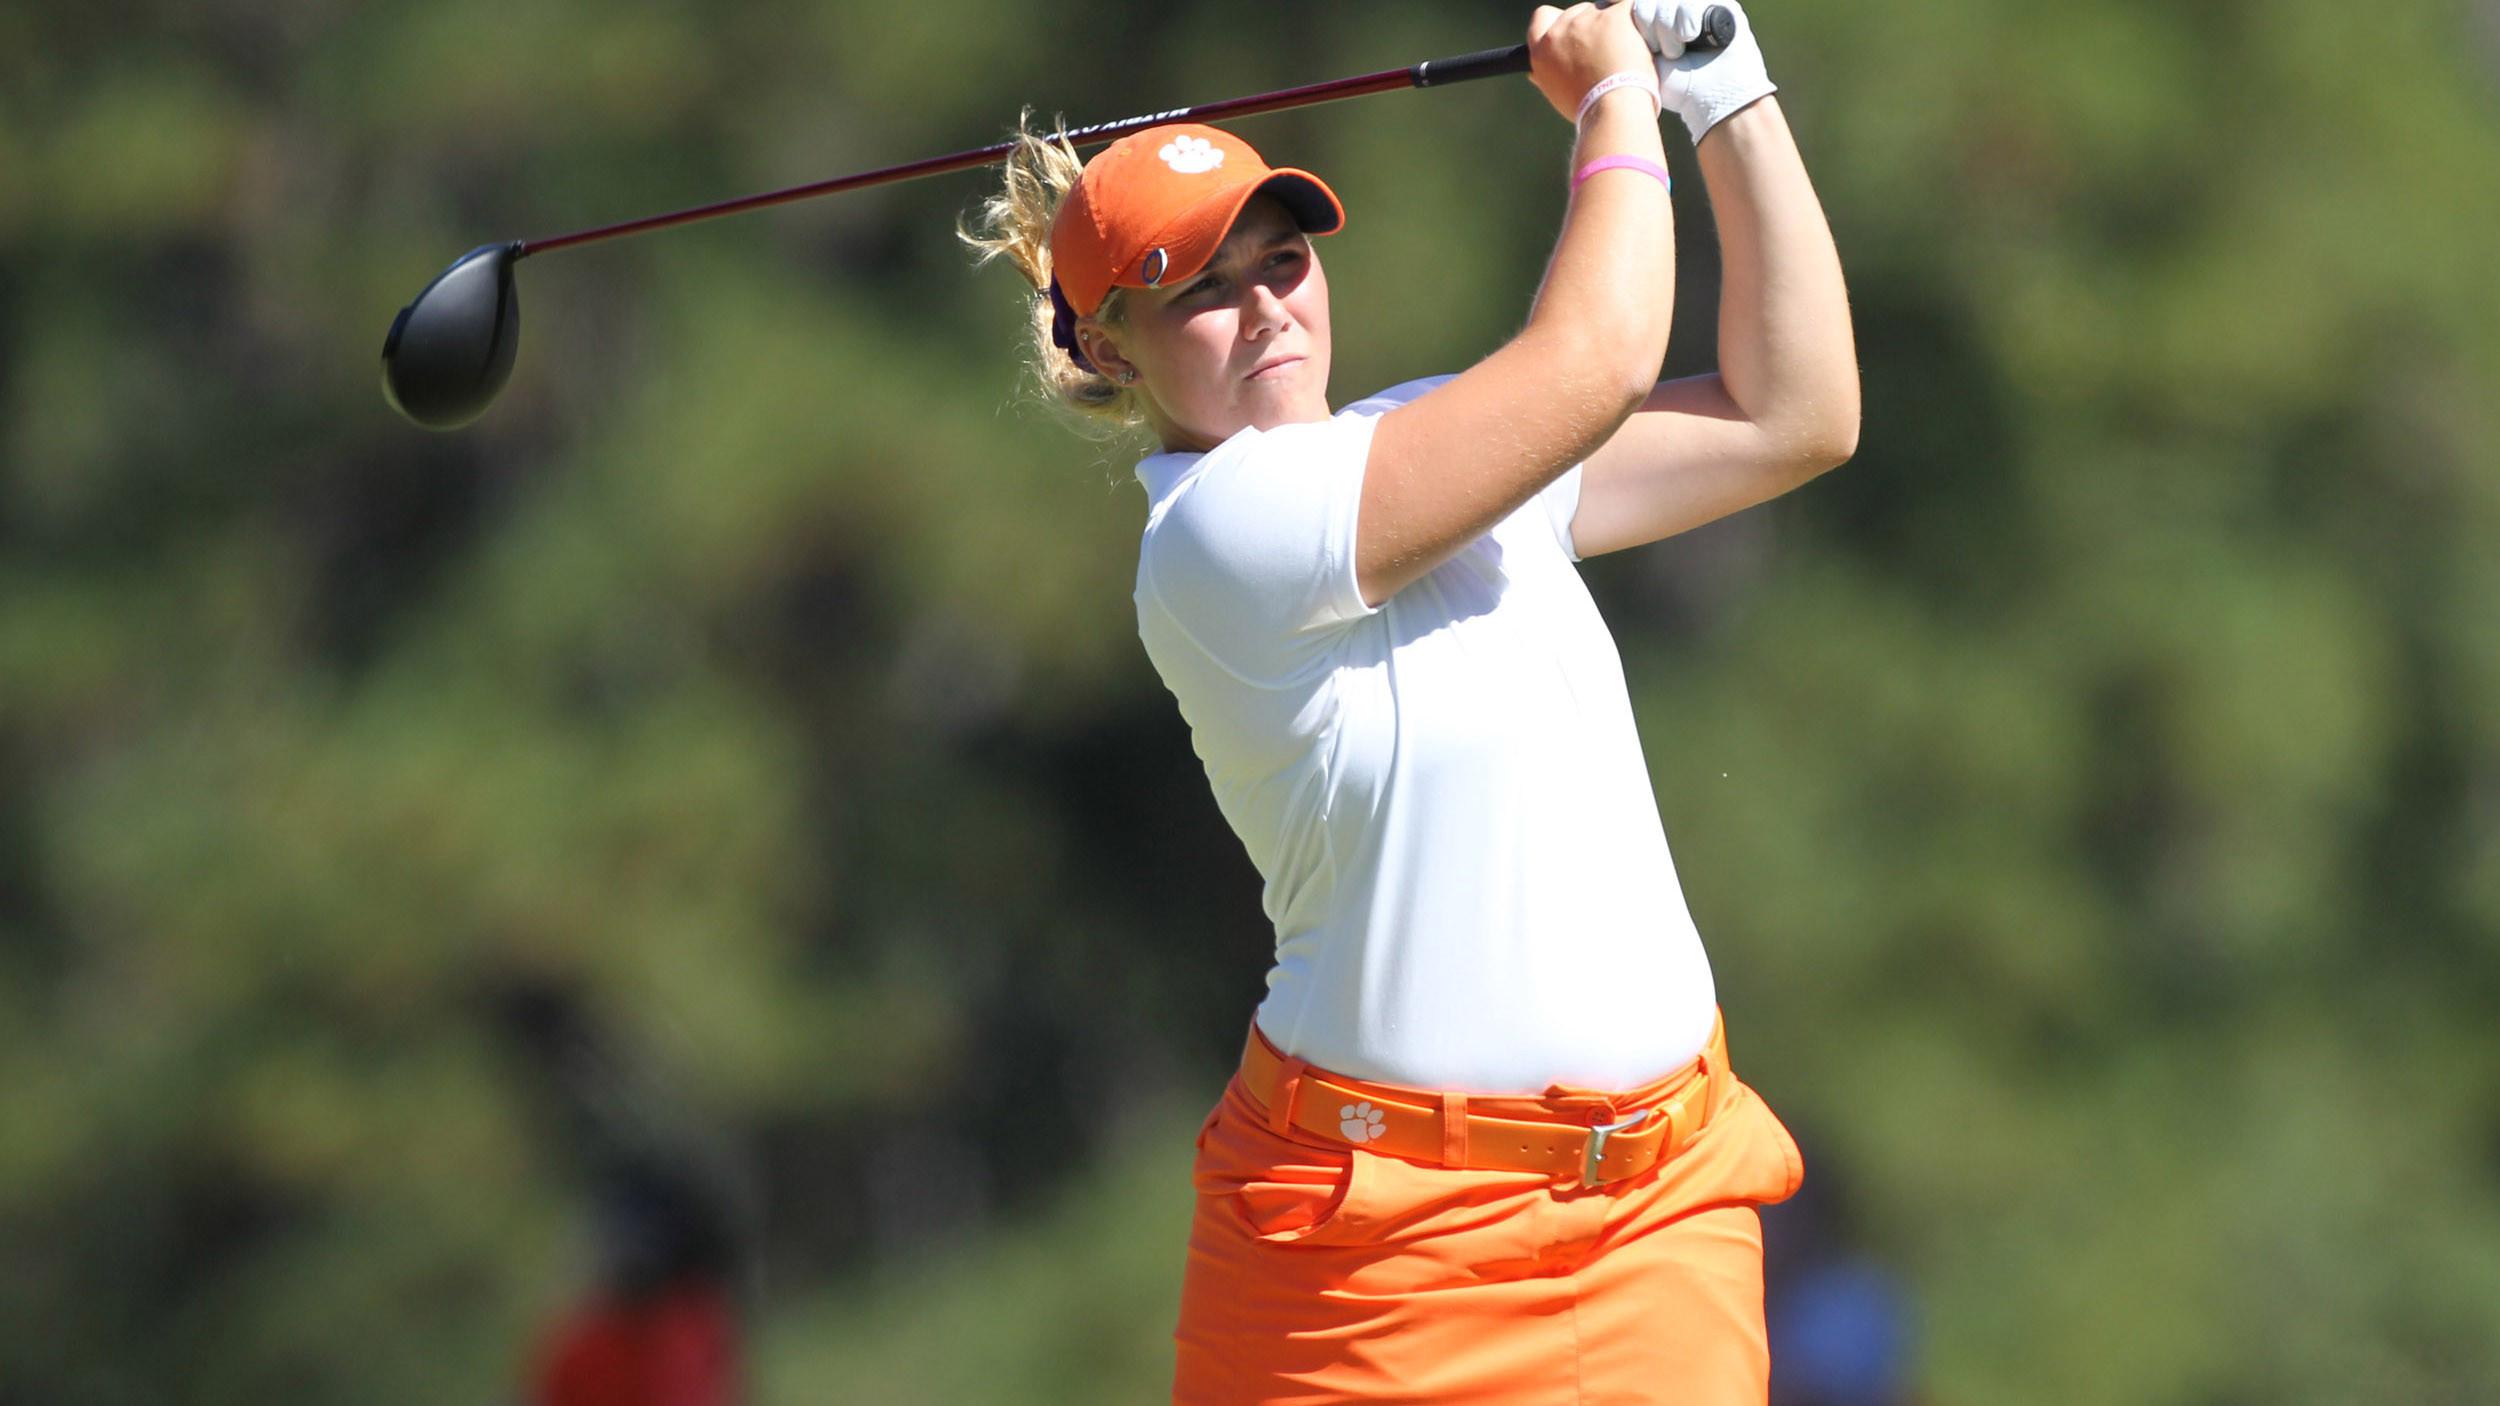 Women's Golf Wraps Up Round 1 in Wilmington